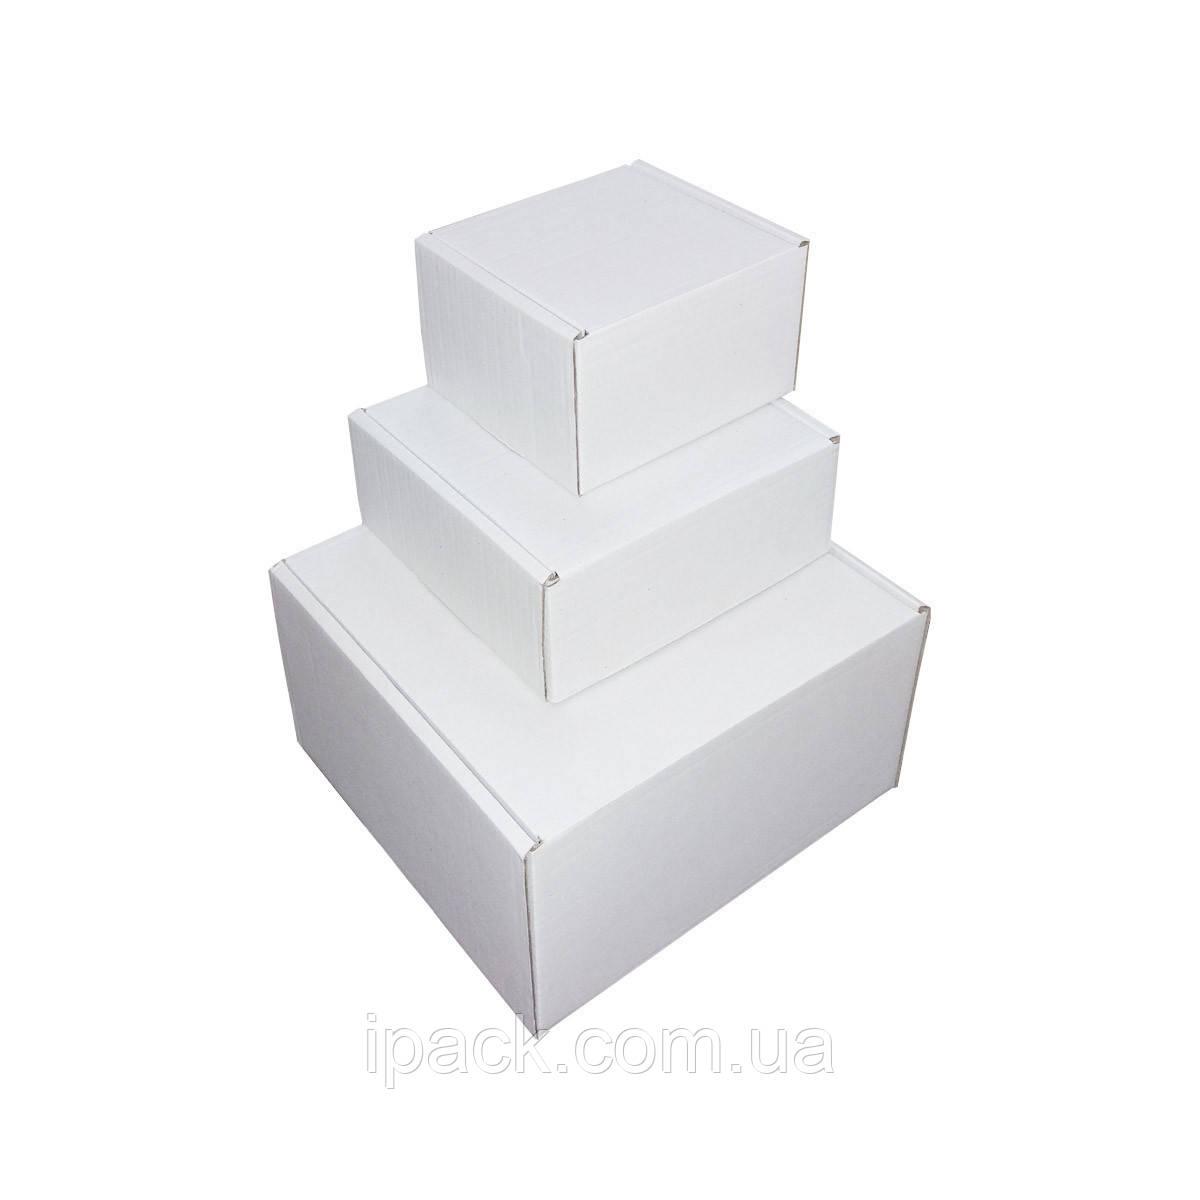 Коробка картонная самосборная, 130*130*70, мм, белая, микрогофрокартон